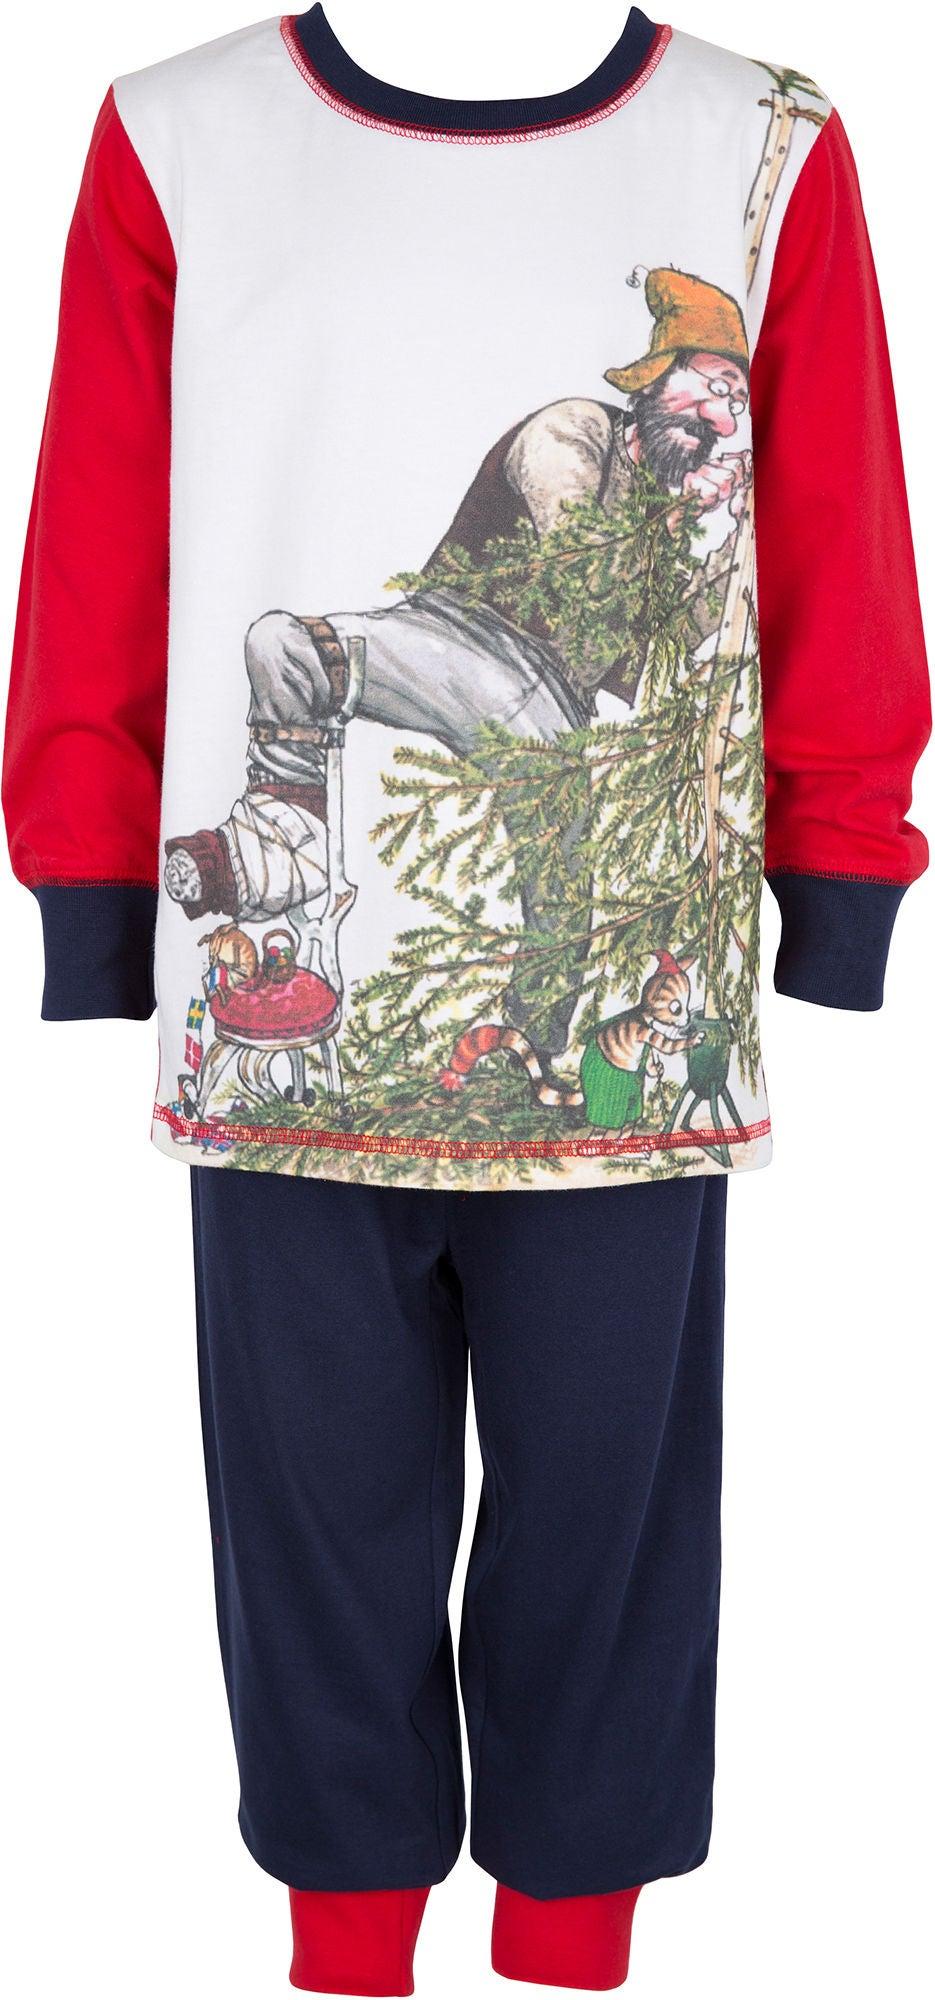 Pettson och Findus Pettson & Findus Pyjamas, White/Red/Navy 92